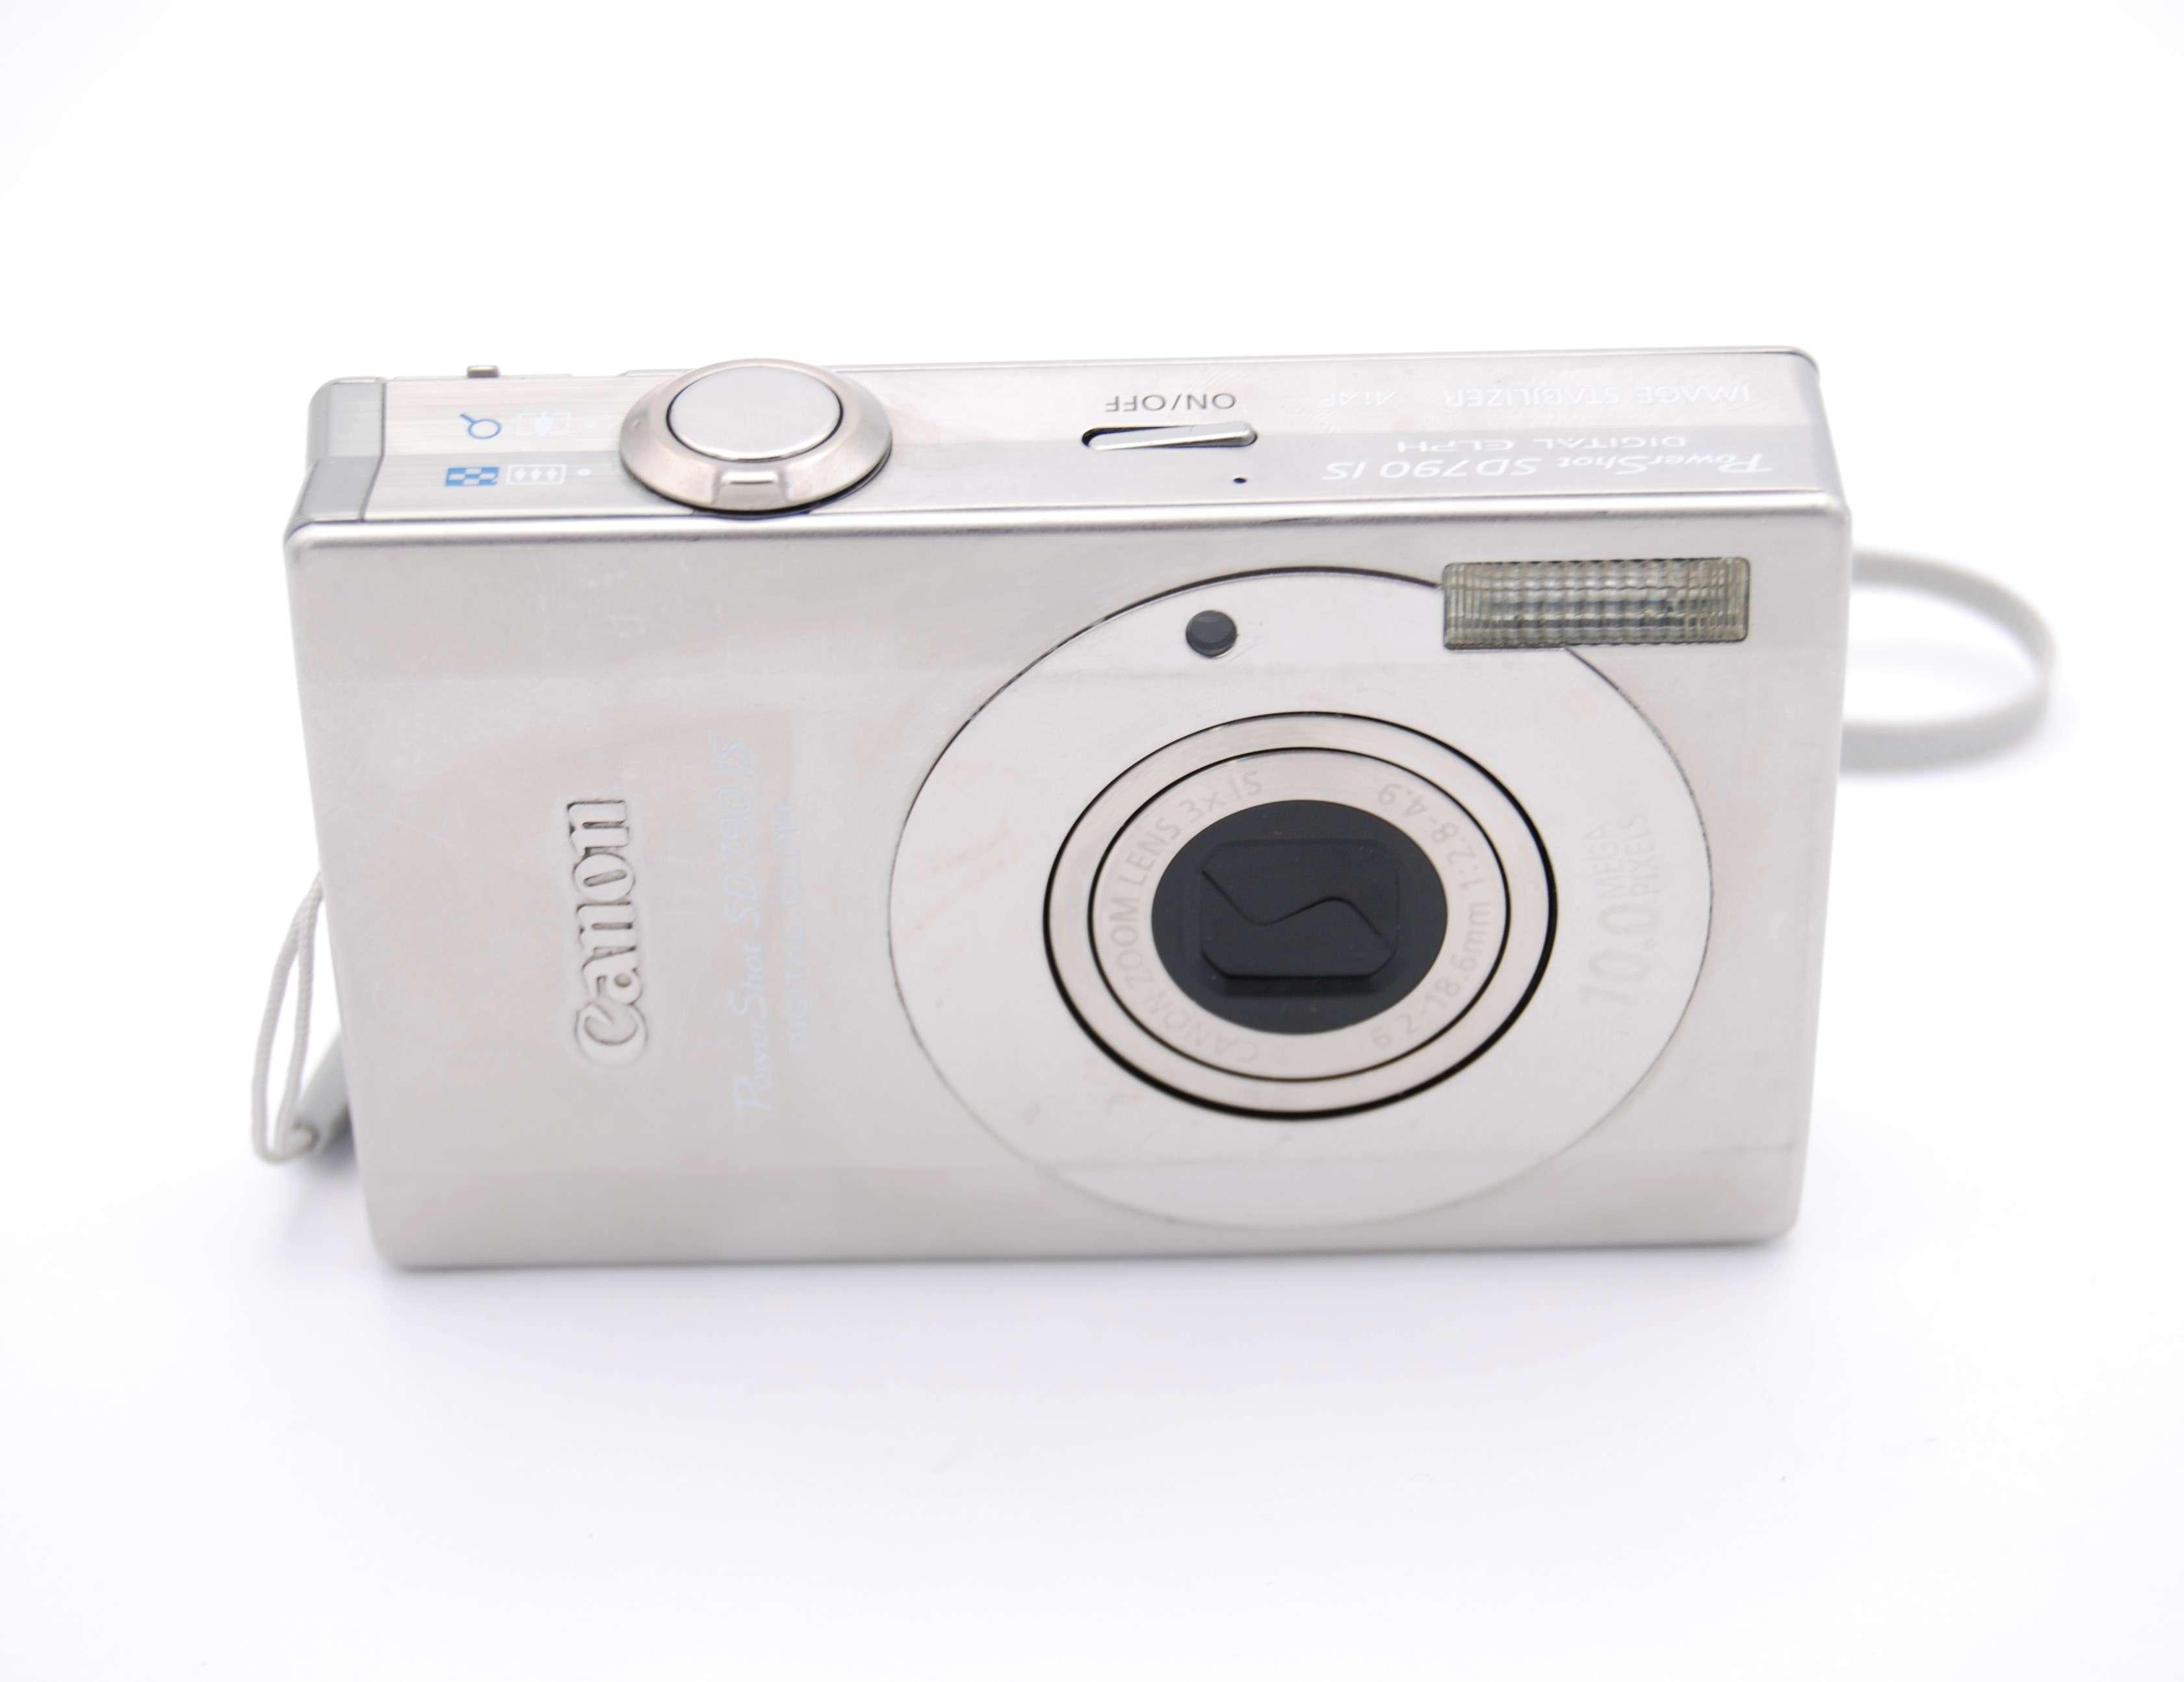 Canon PowerShot Digital ELPH SD790 IS / Digital IXUS 90 IS Digital Camera